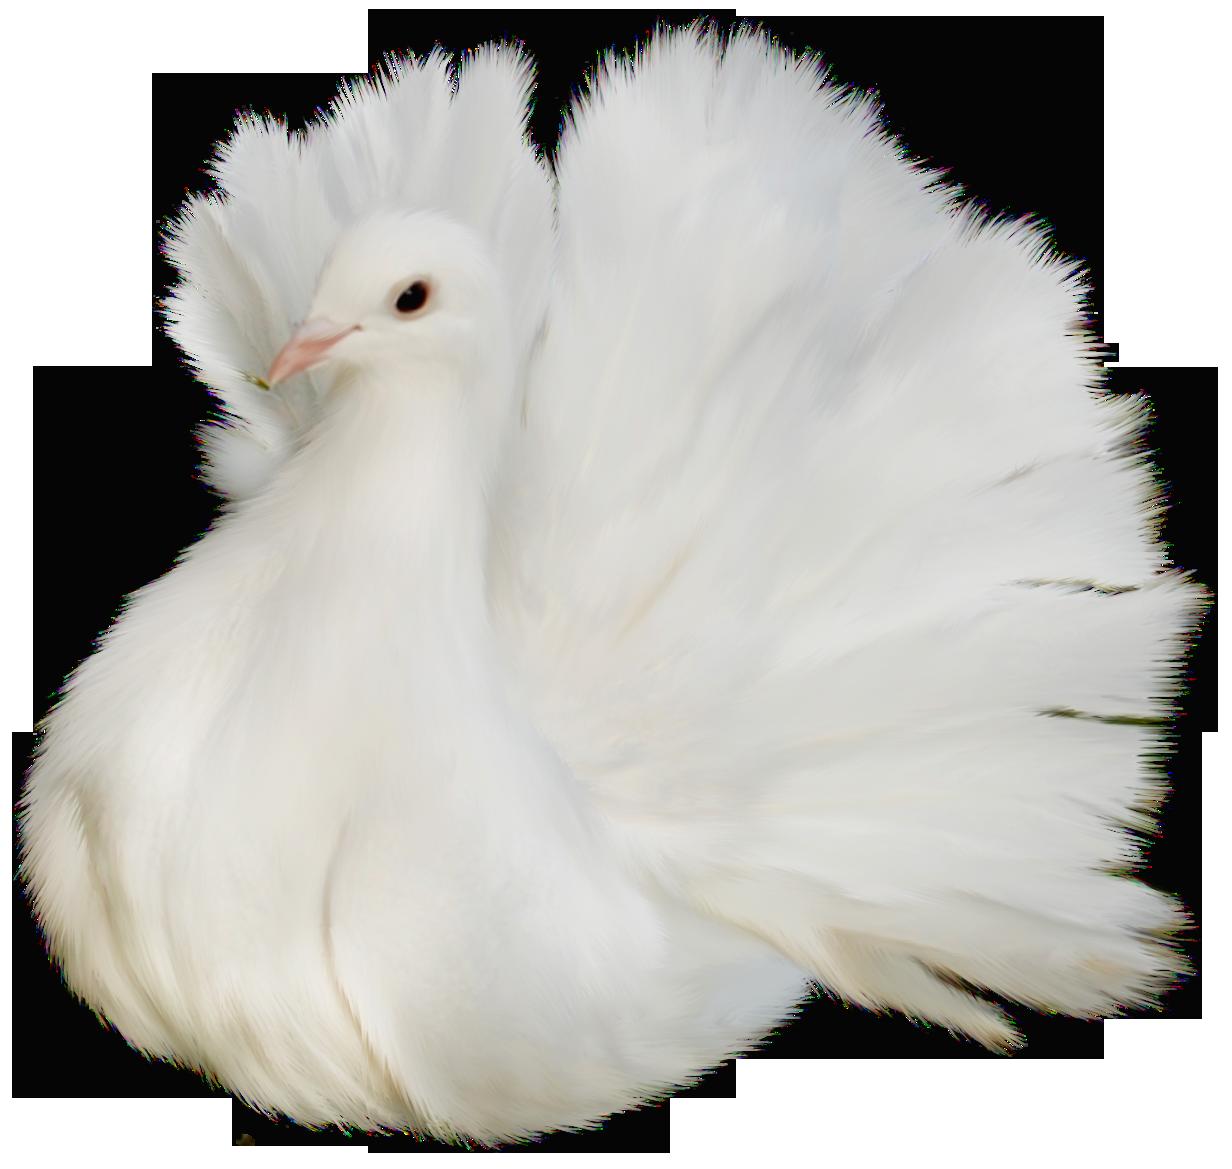 Doves clipart feather. White beautiful delicate dove